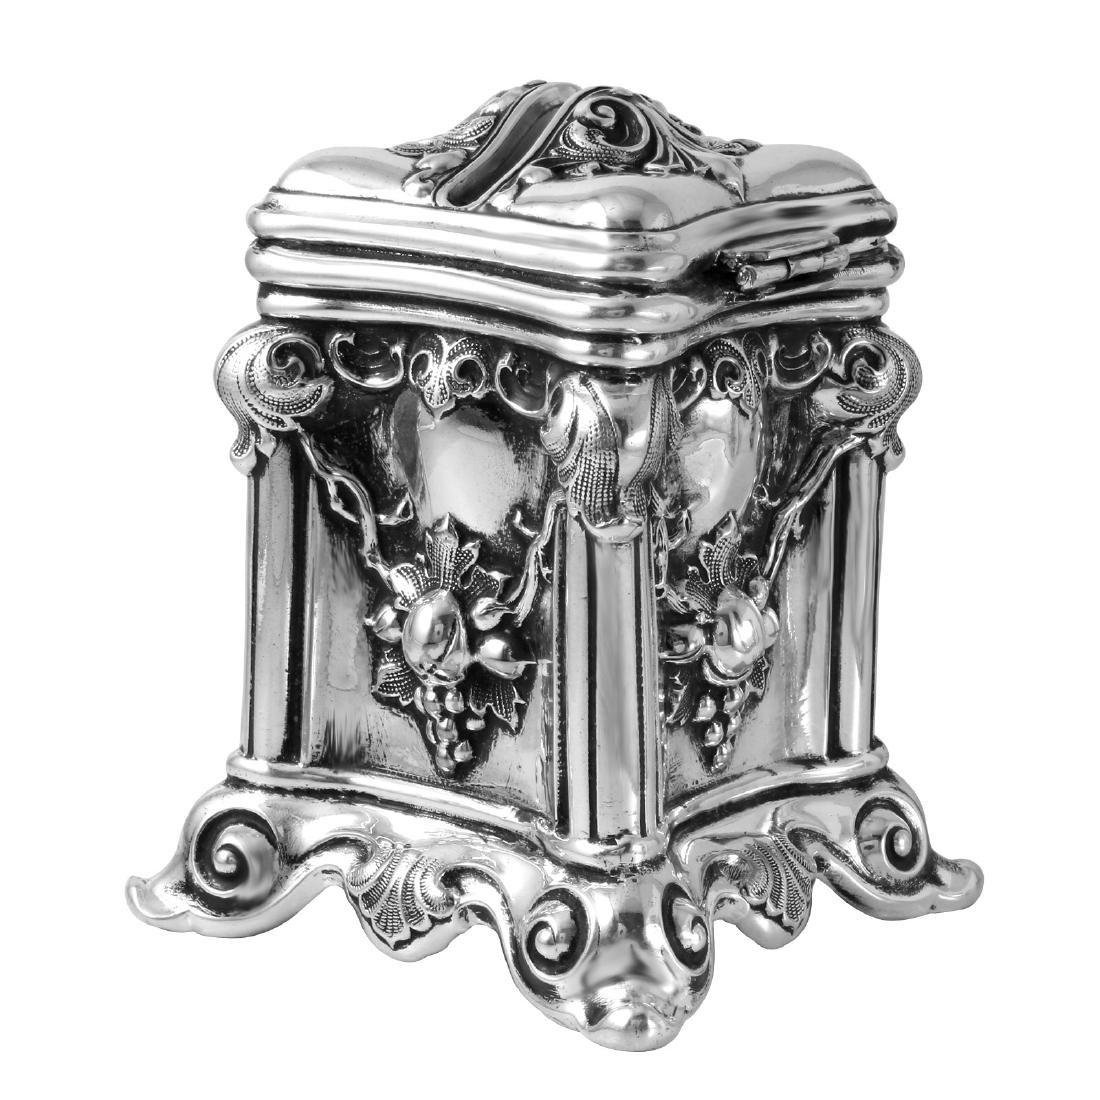 Antique Tzedakah Box Judaica, Sterling Hollowware - 5